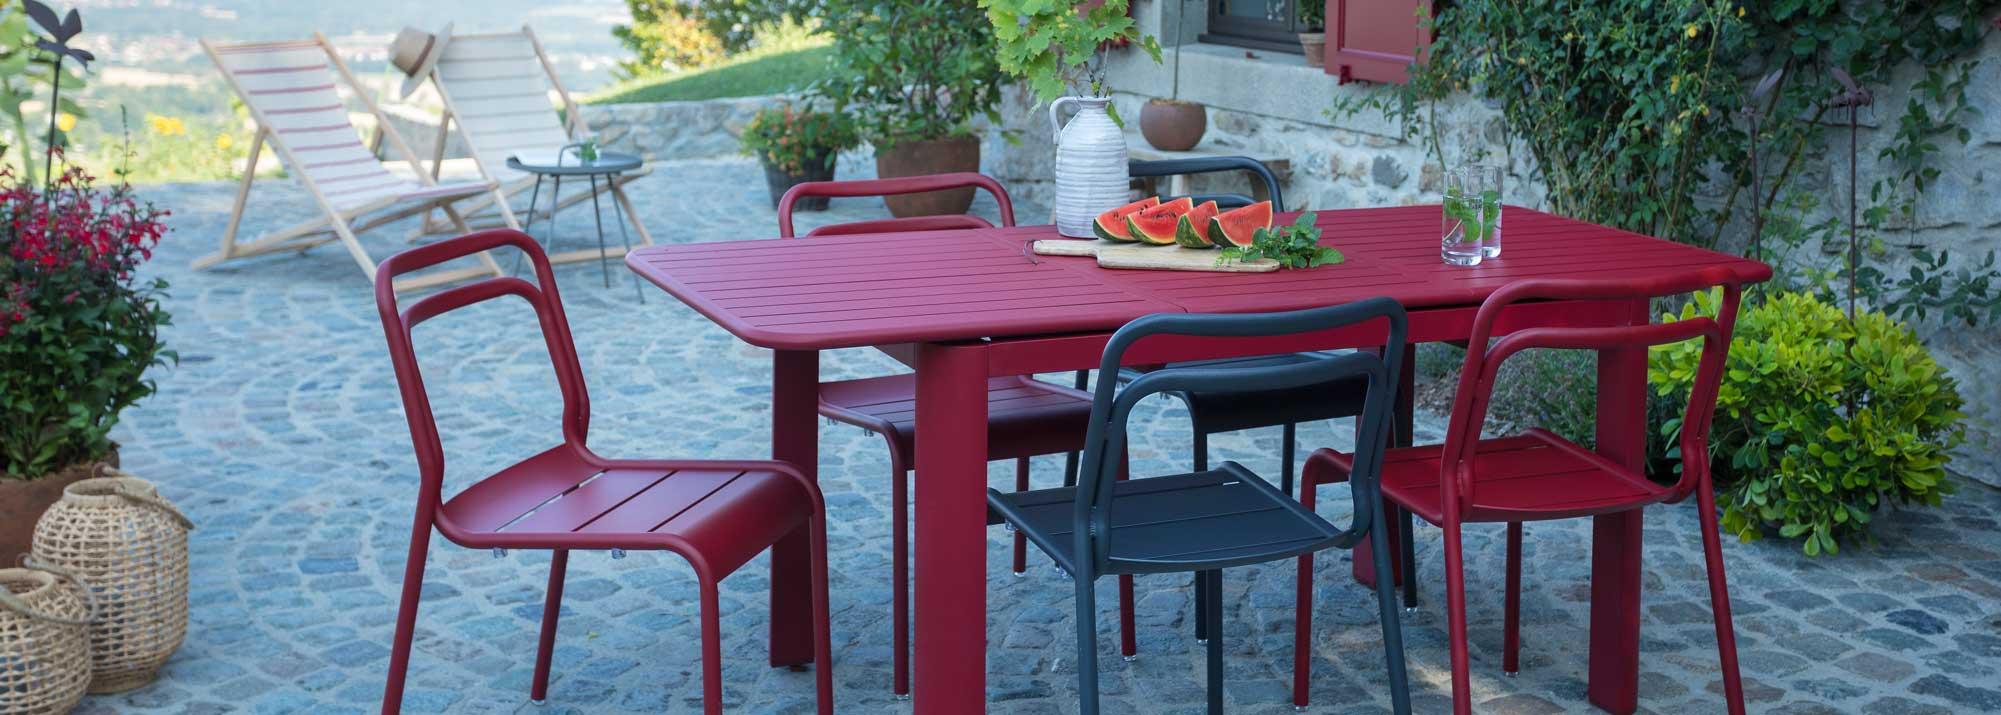 Table De Jardin : Botanic®, Tables De Jardin En Aluminium ... intérieur Salon De Jardin En Teck Pas Cher